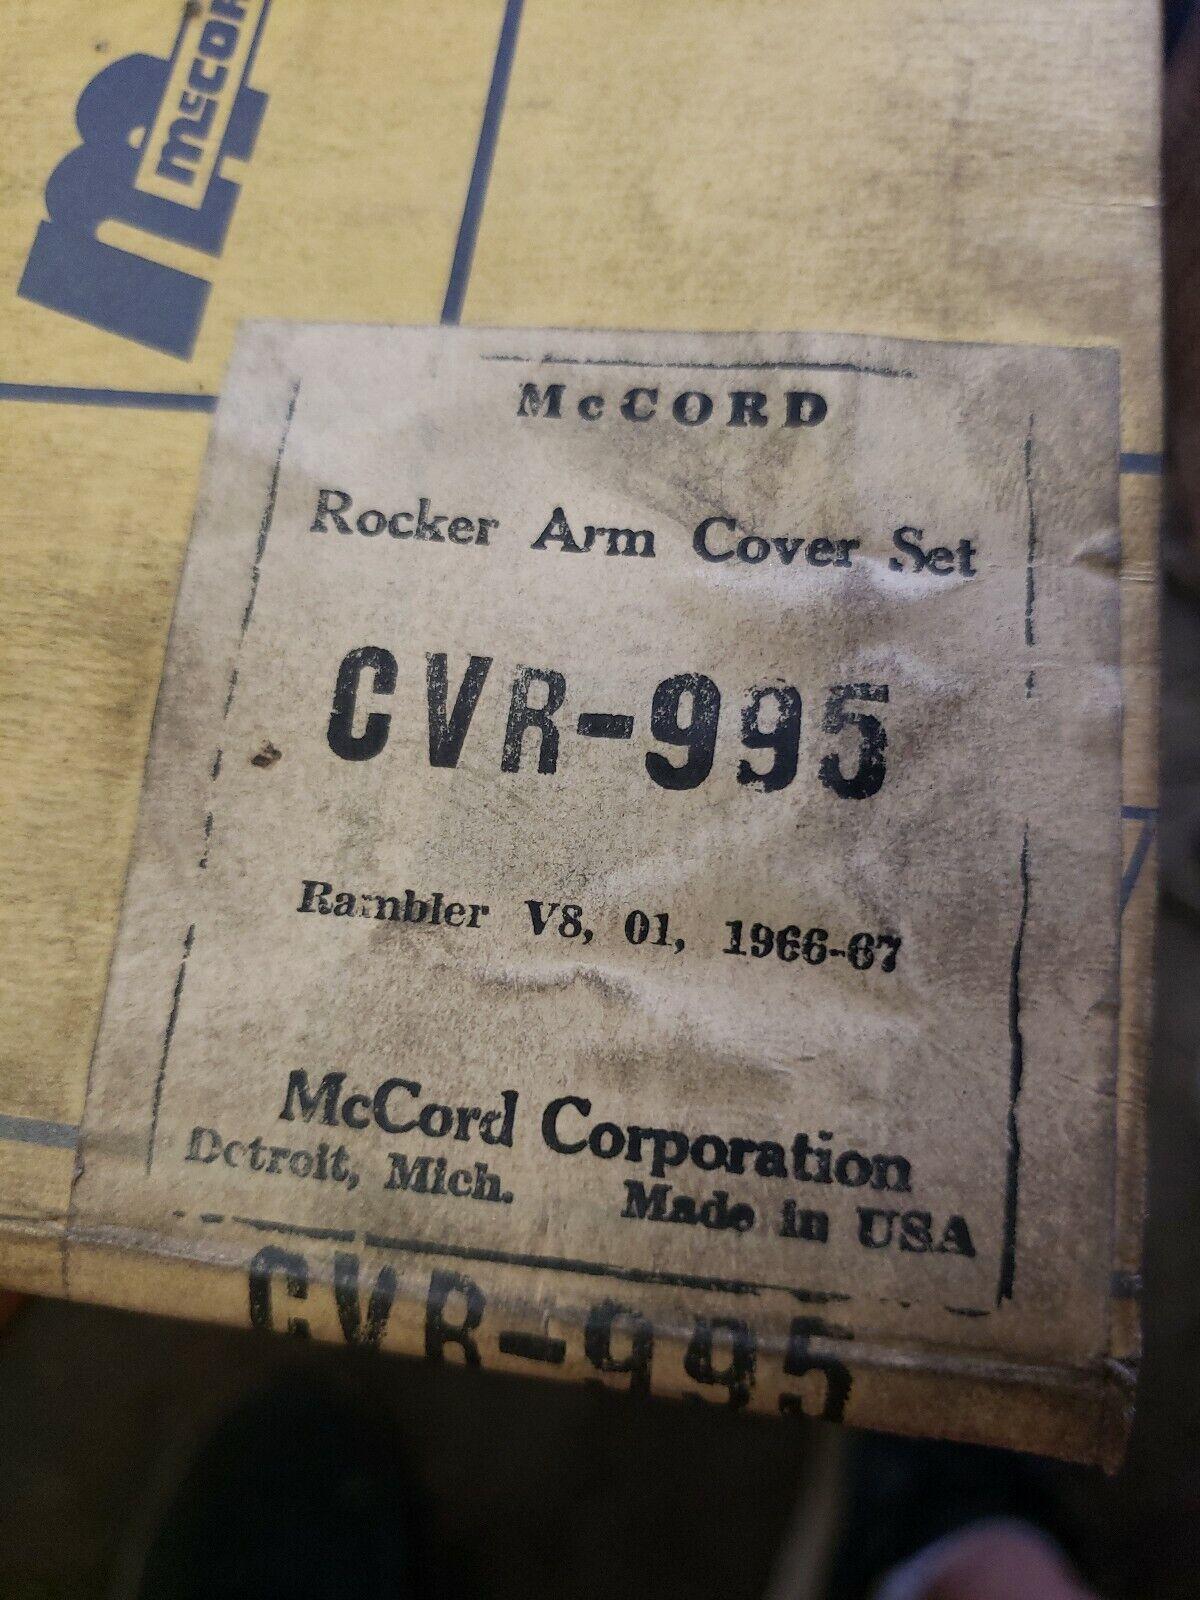 1961-1969 Corvair Valve Cover Gasket Set McCord CVR-911